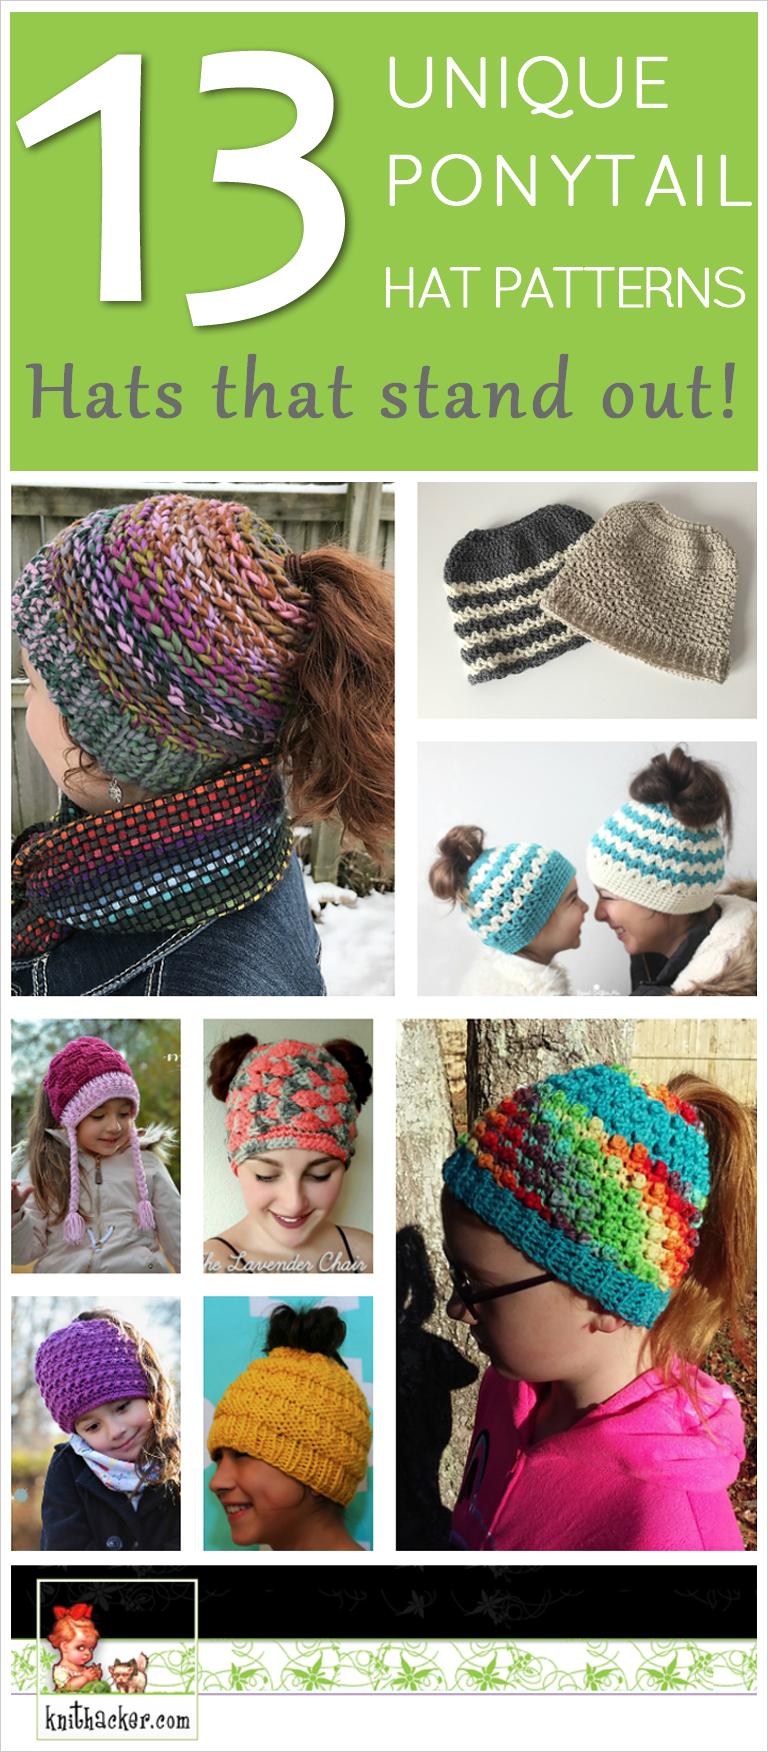 13 Unique Ponytail Hat Patterns – These Knit & Crochet Messy Bun ...